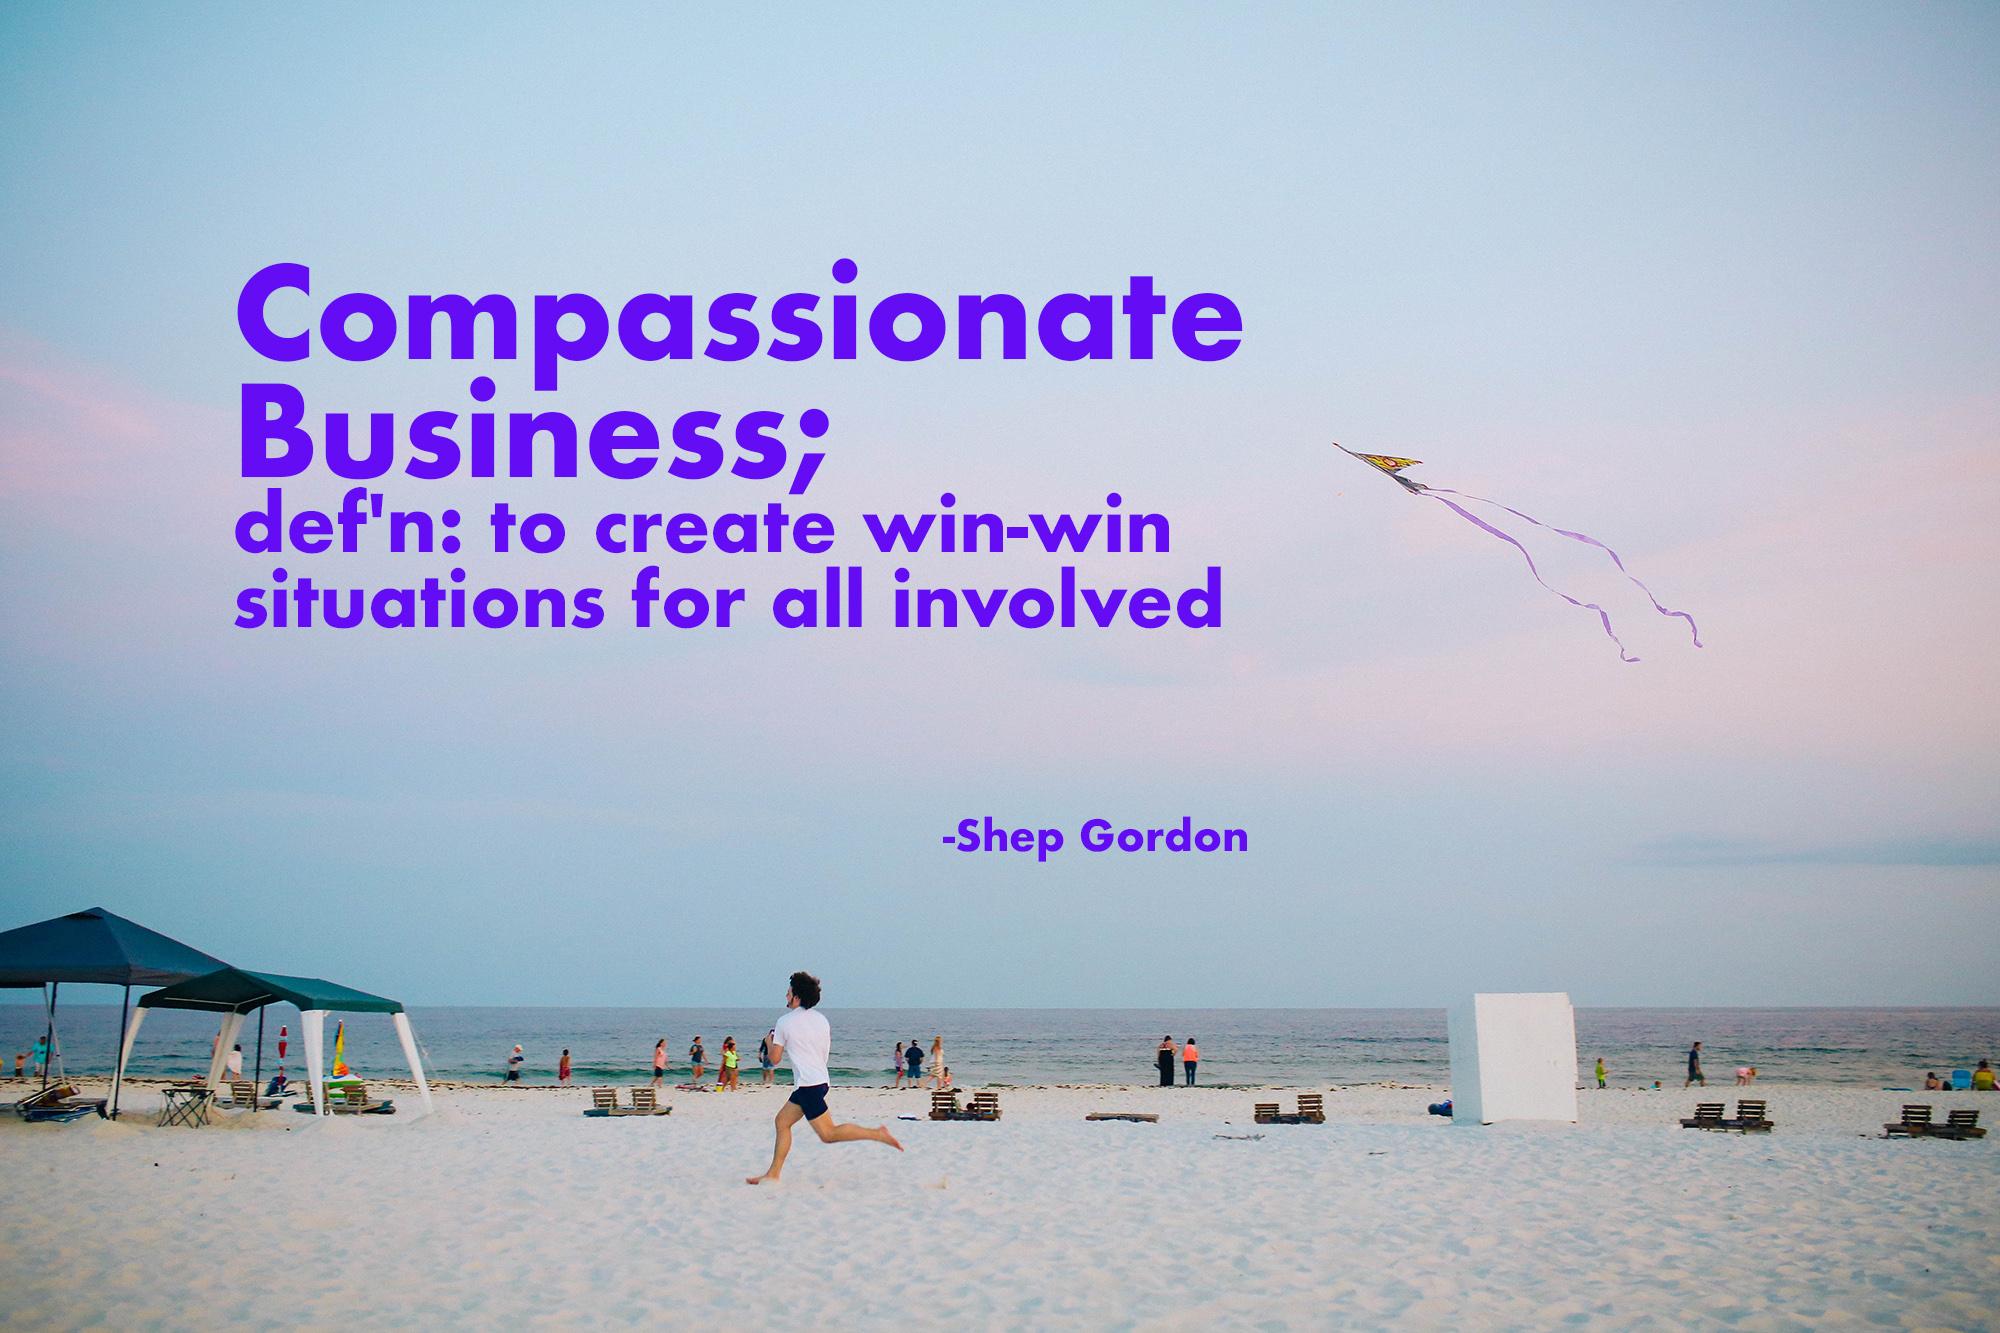 compassionate business